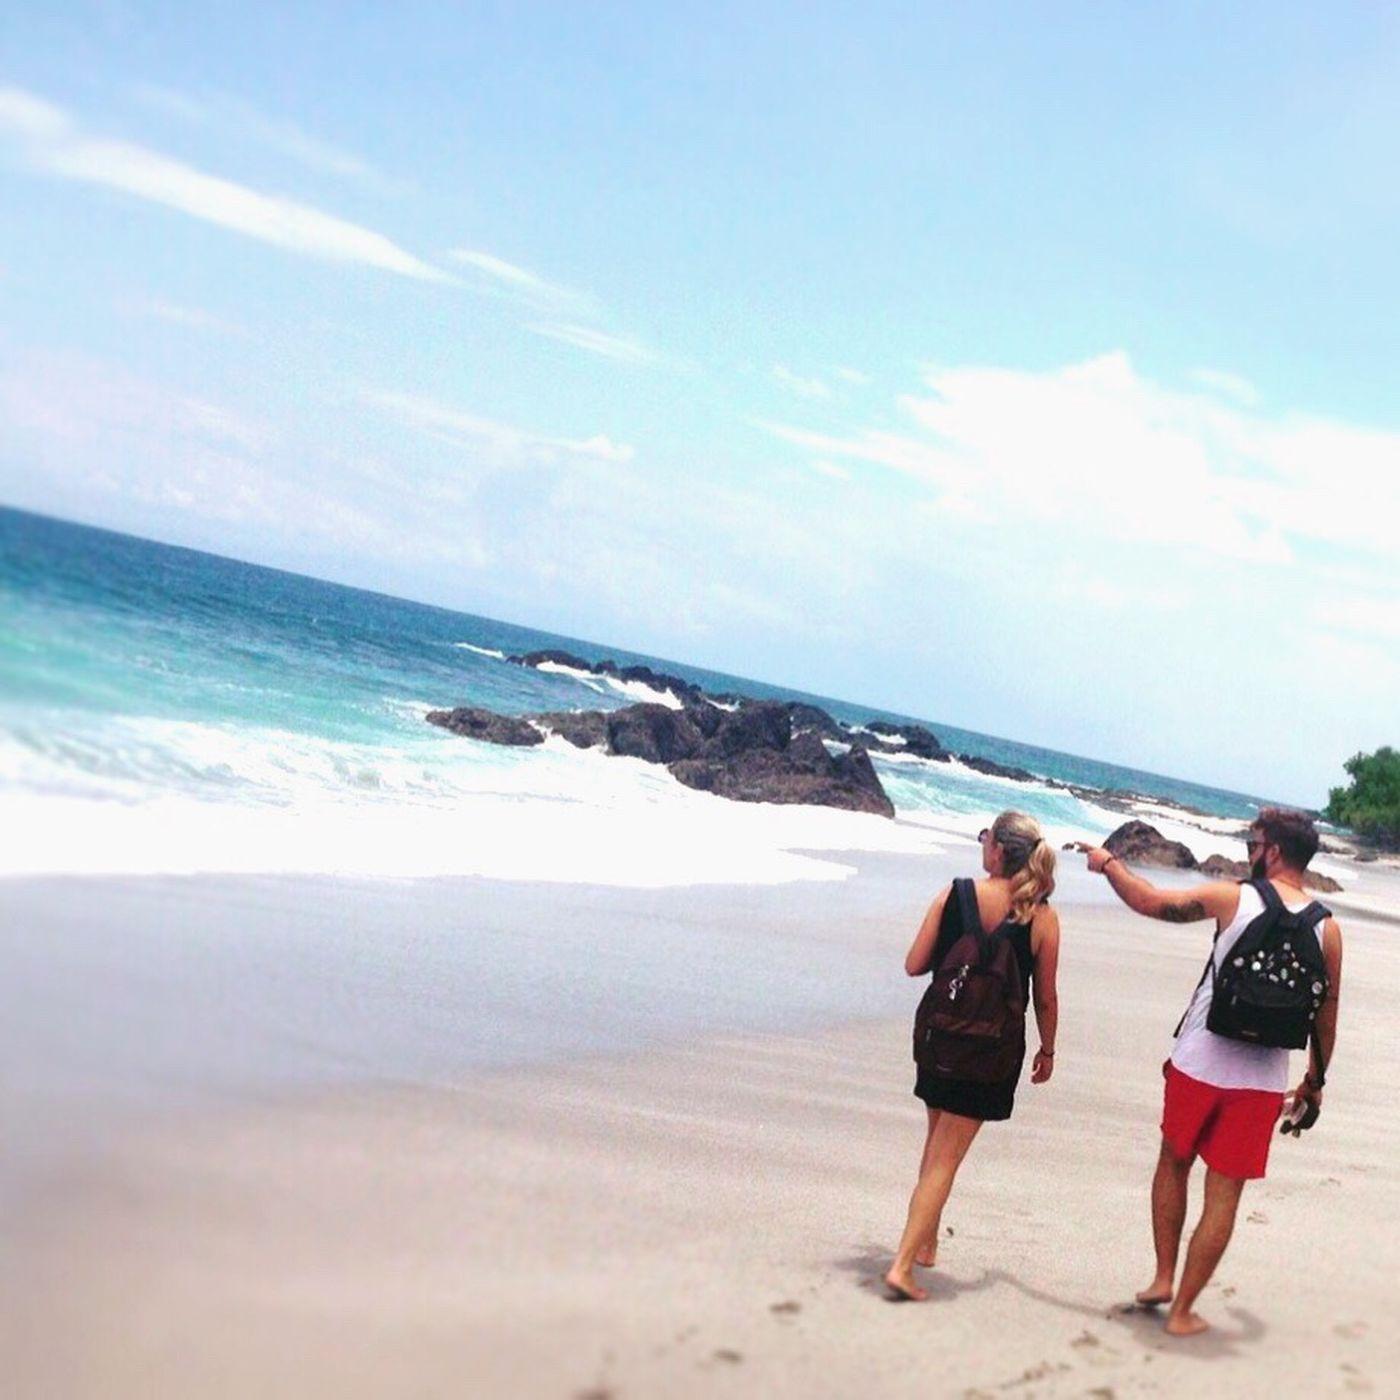 Bei ricordi ❤️ Costa Rica Holiday Love Vogliovivereacolori Summer Paradise First Eyeem Photo